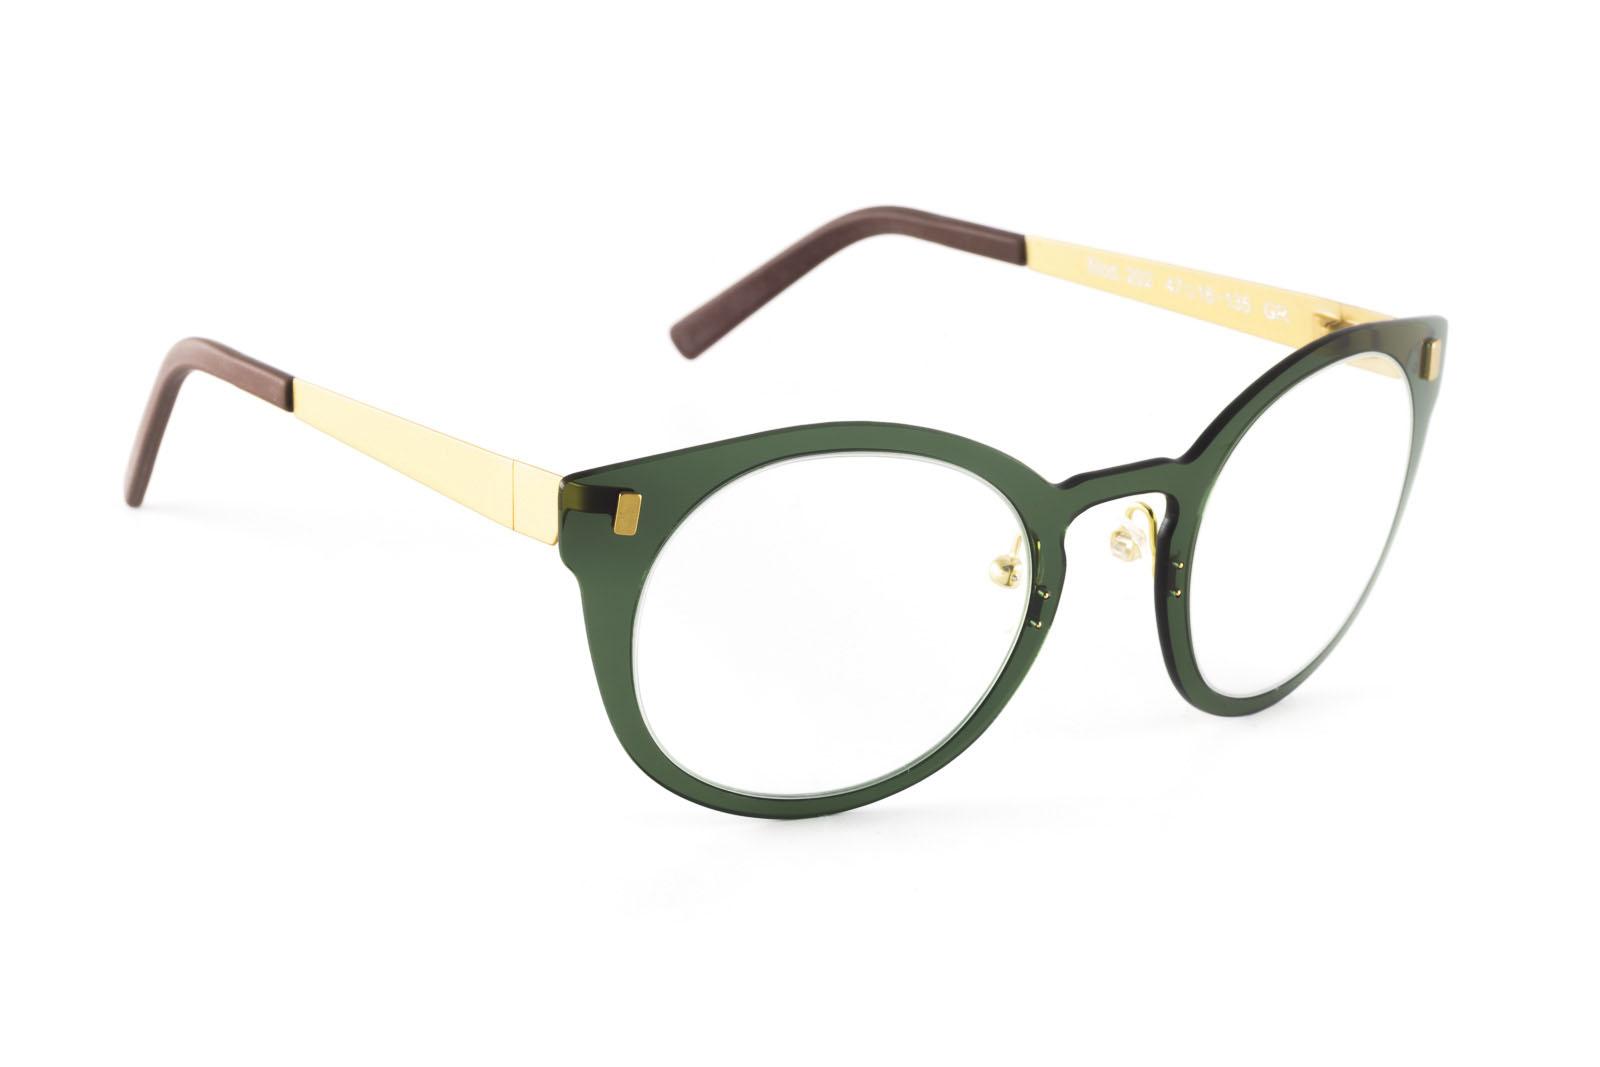 202 gr v pride eyewear